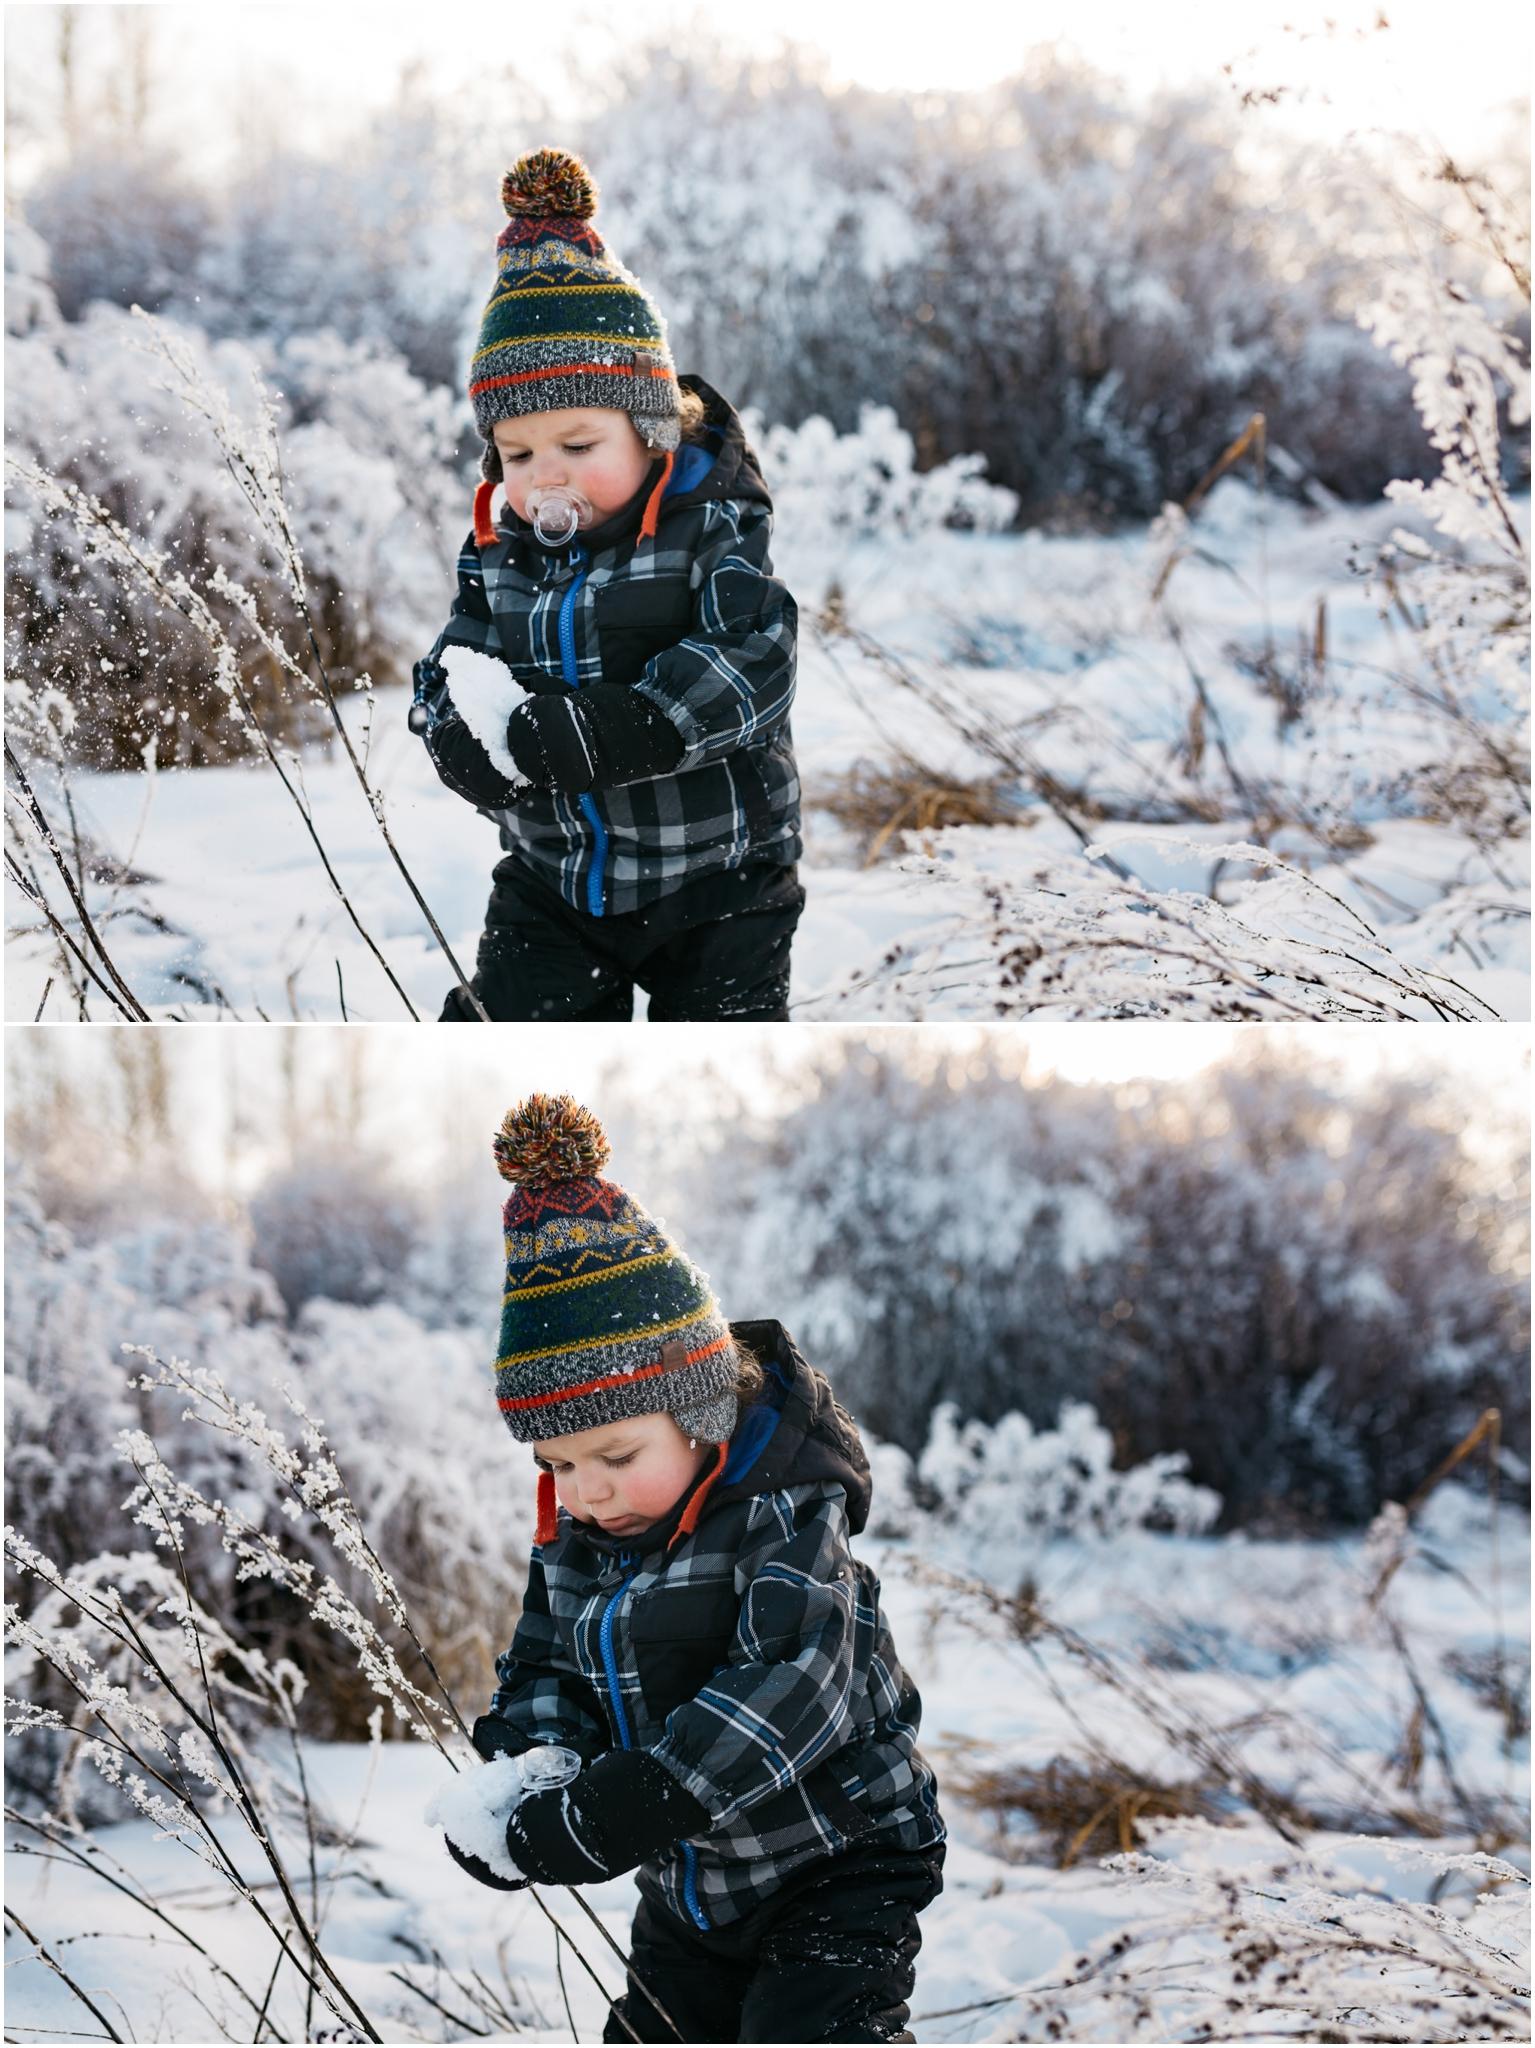 Treelines Photography - Edmonton Photographer - Snow Play - Edmonton Hoar Frost